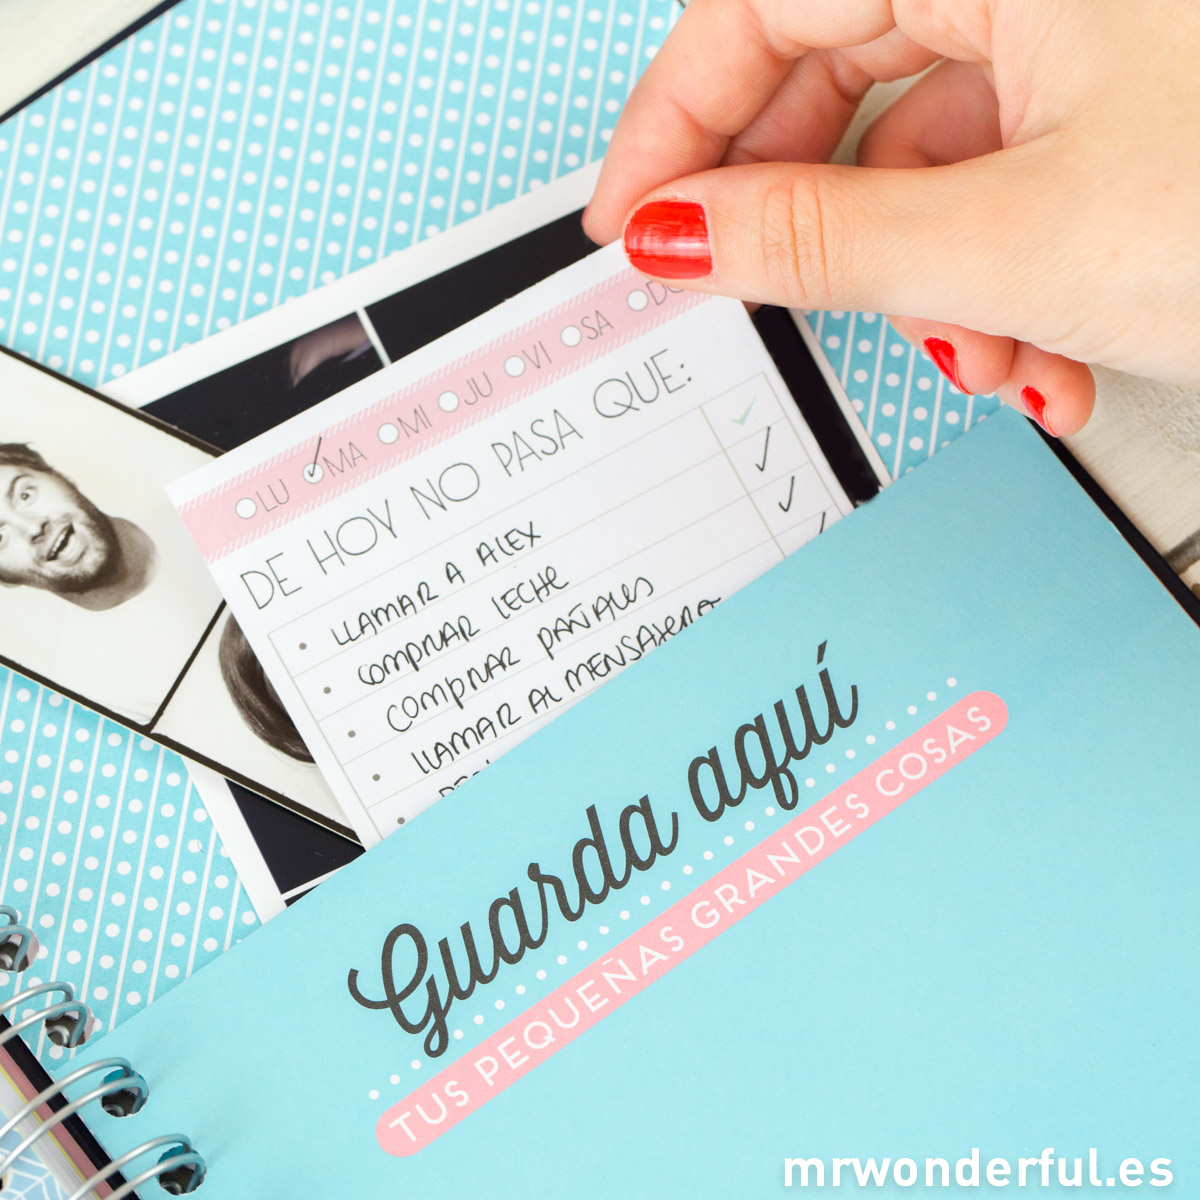 mrwonderful_AGENDA-WONDER_2014-278-Editar